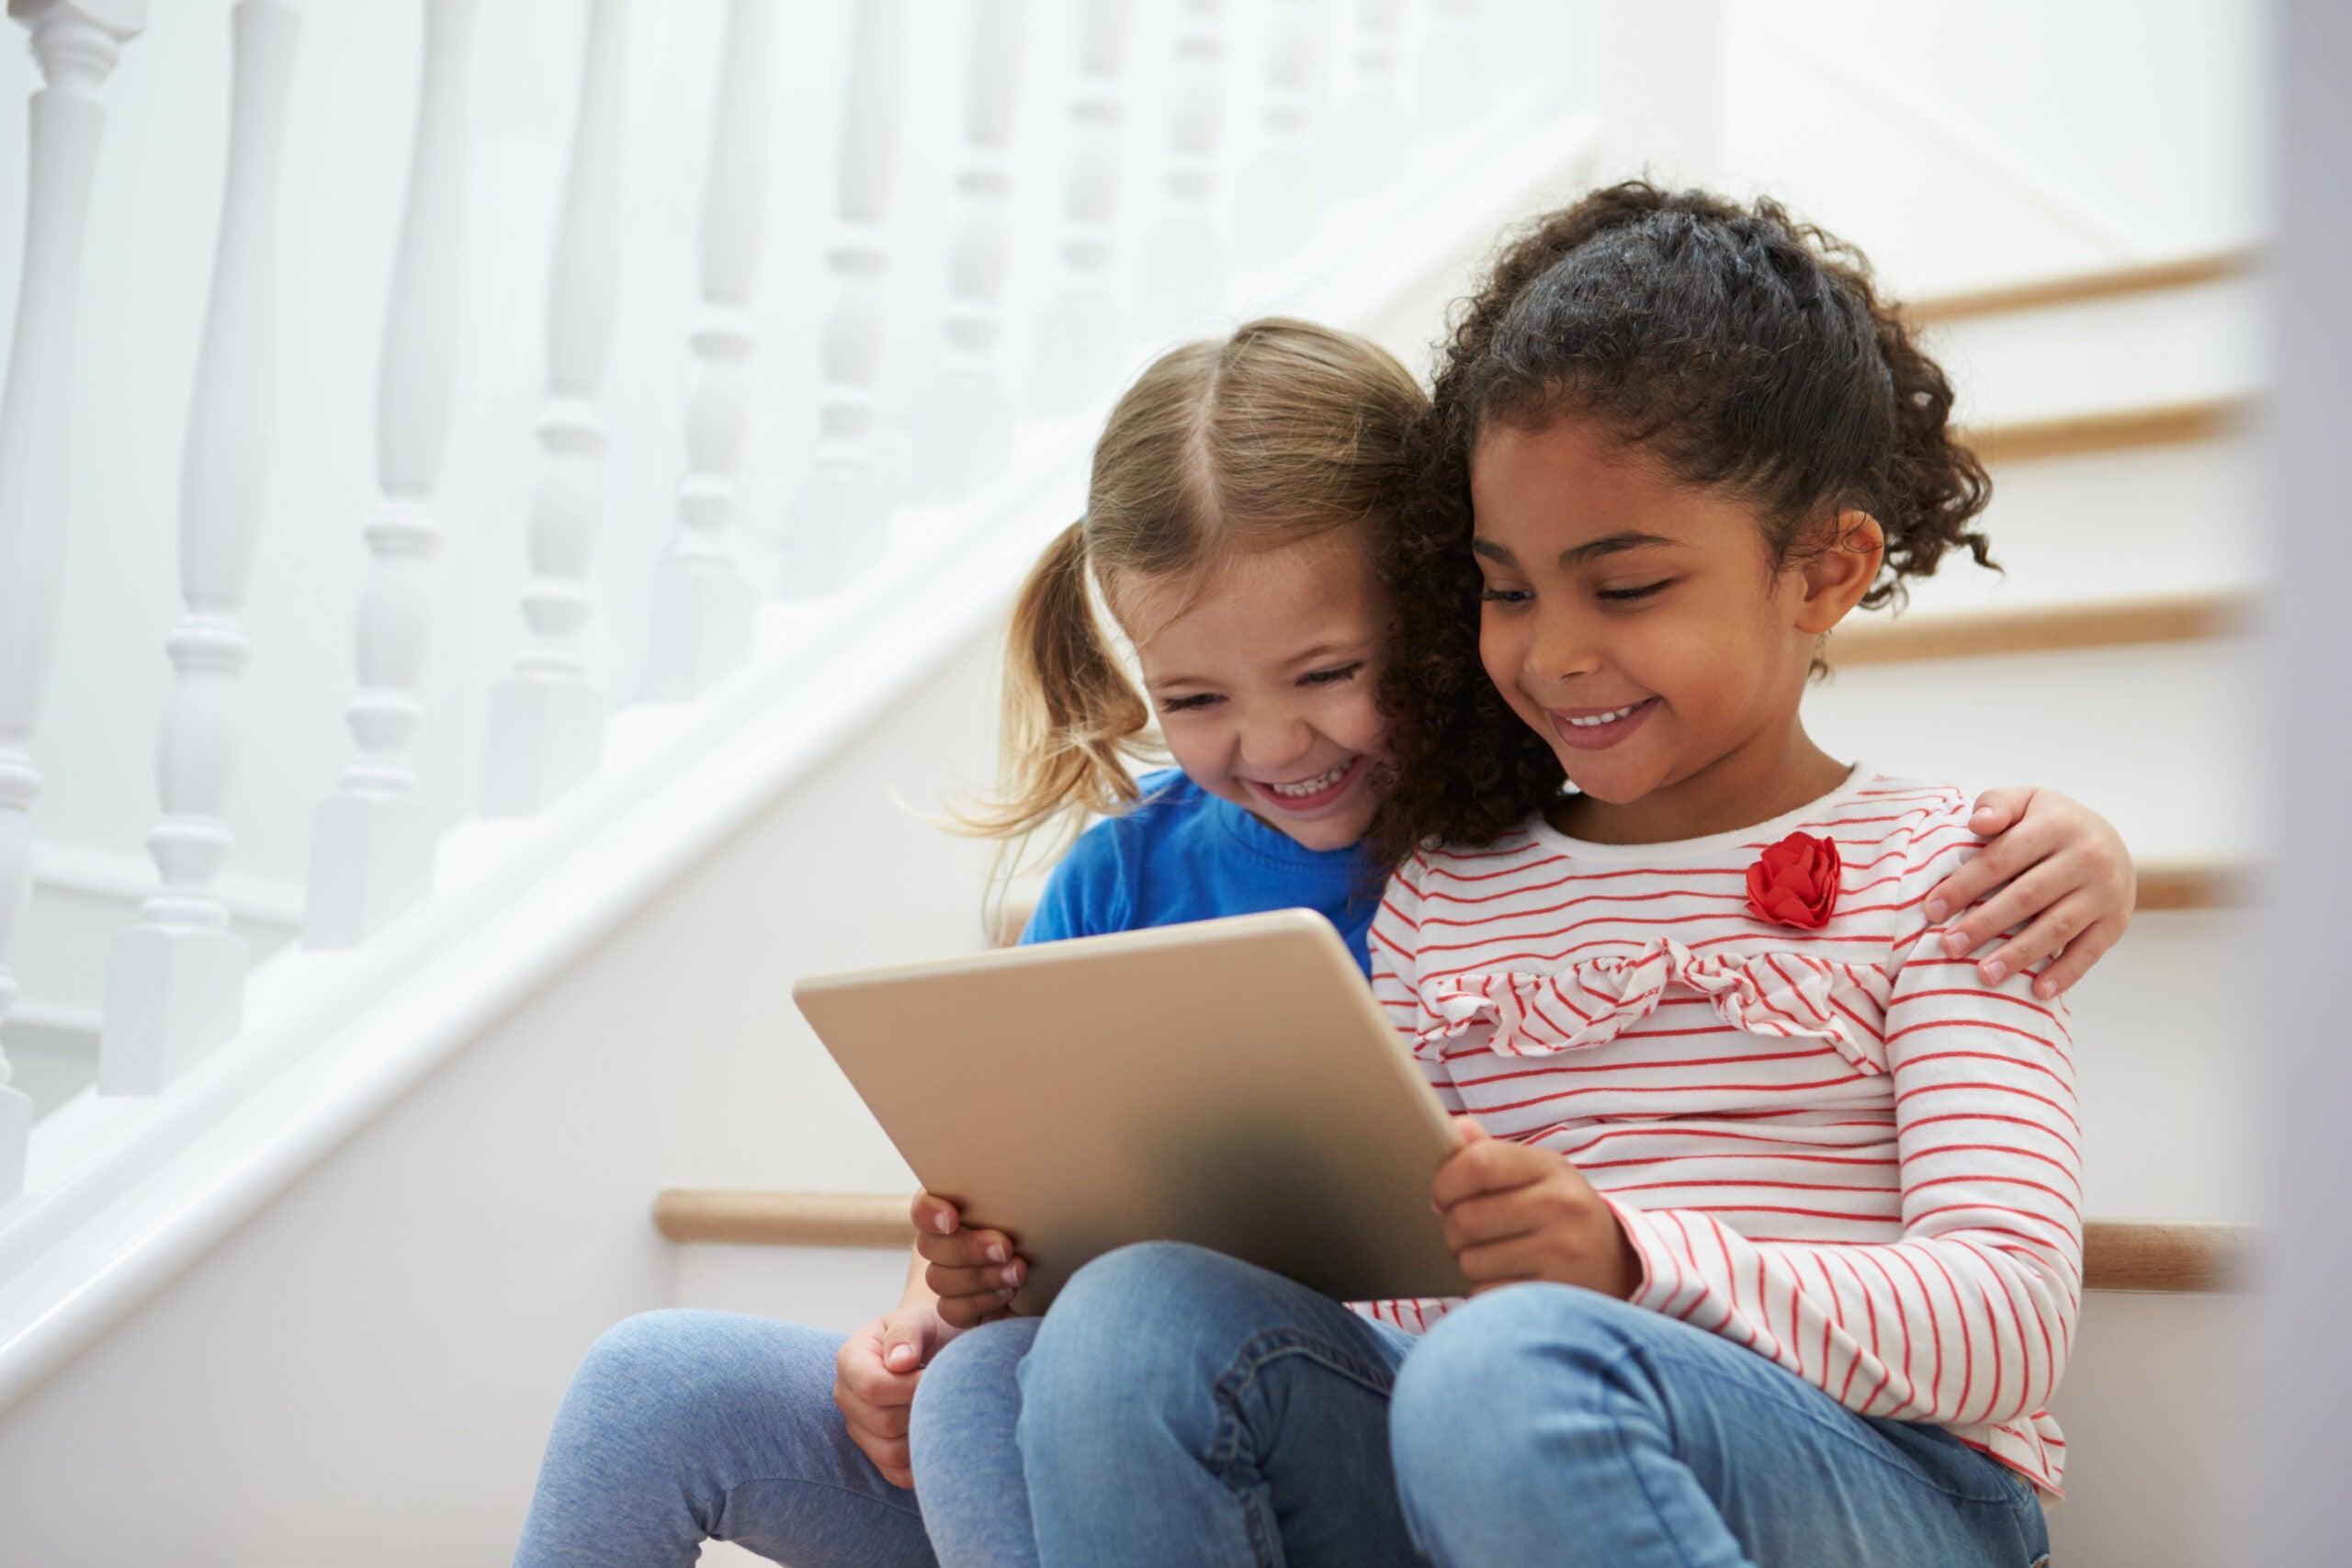 Helping children be safer, smarter, happier internet explorers